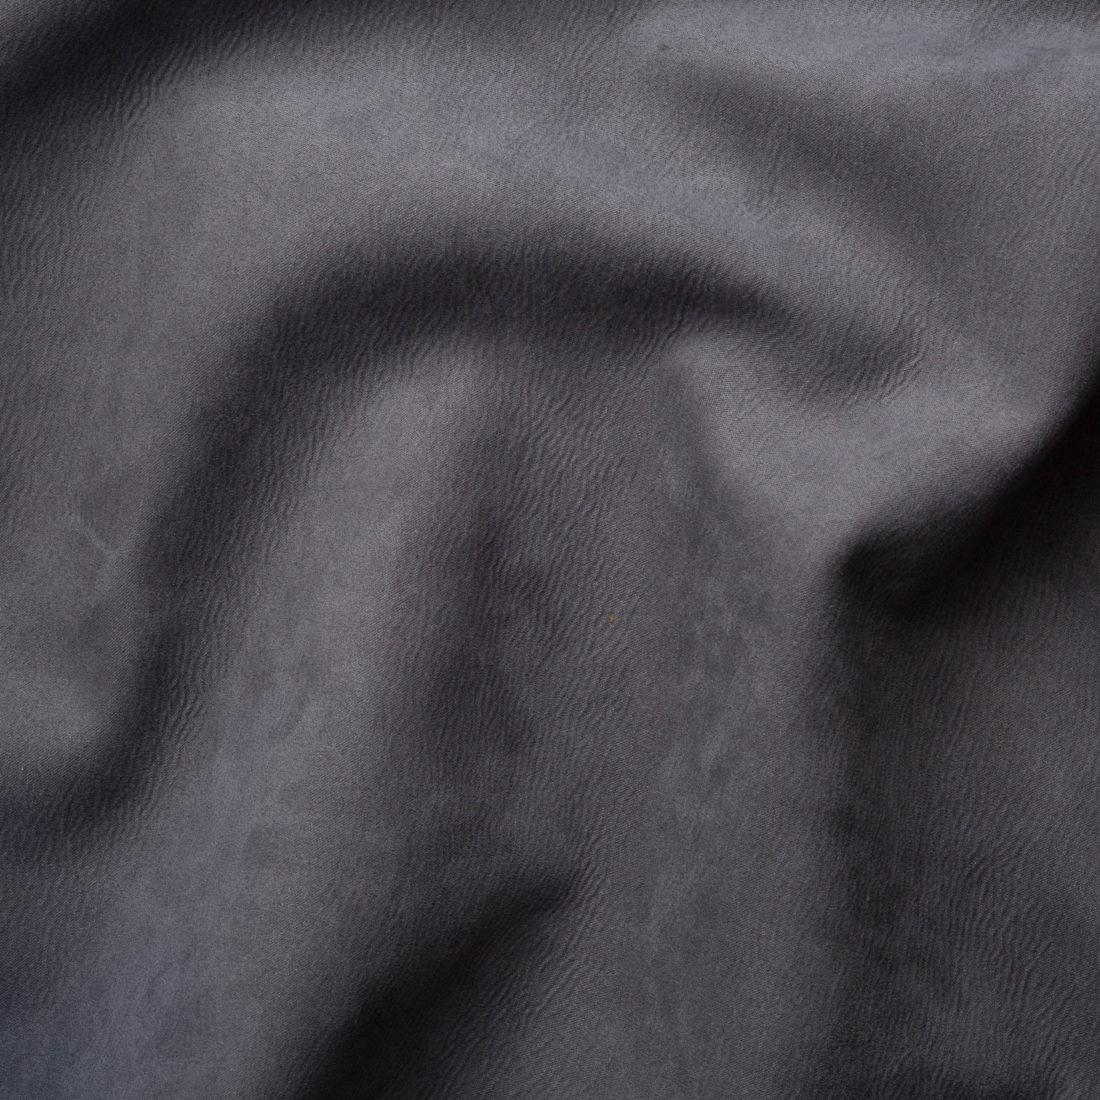 Мебельная ткань Diva 113 Grey, искусственная замша